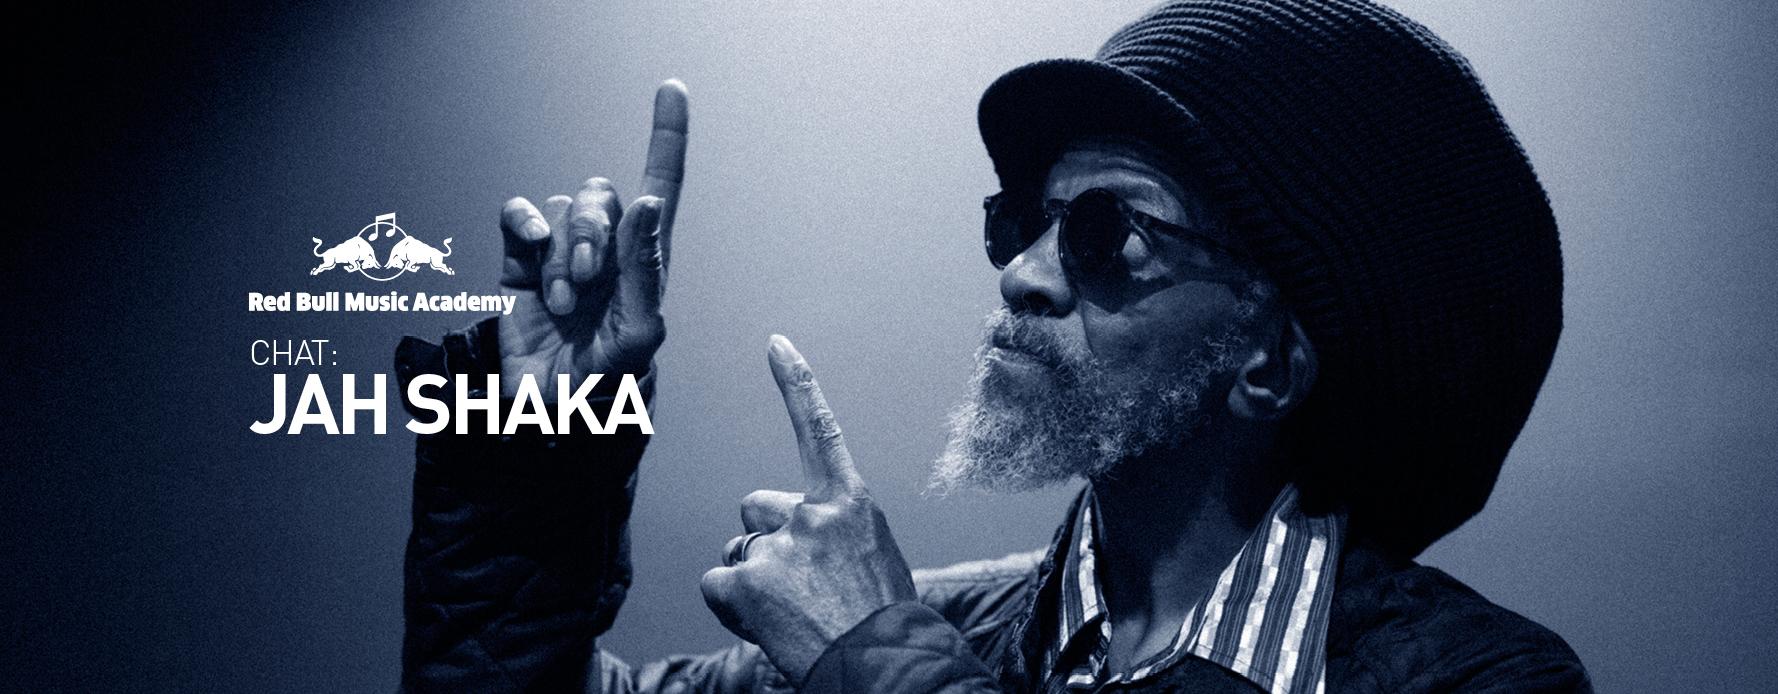 source: Jah Shaka